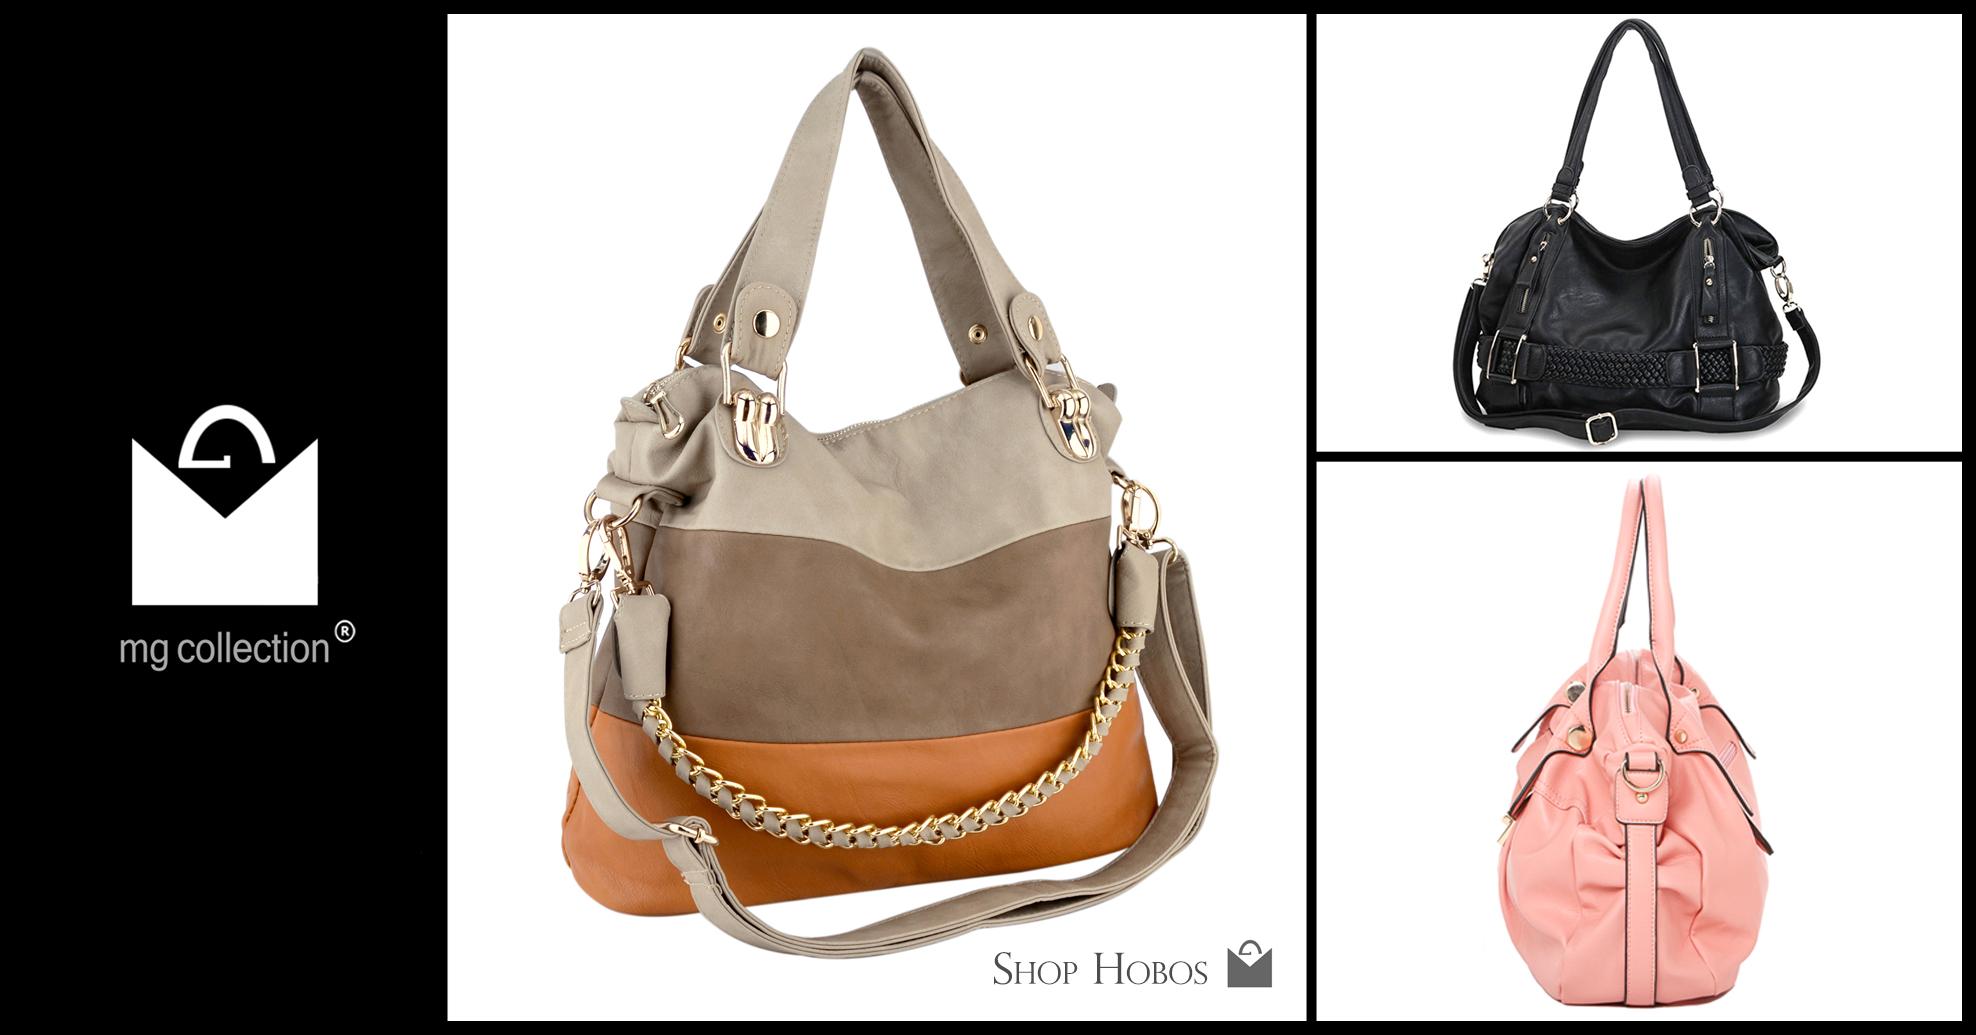 Shop Hobo Handbags from MG Collection